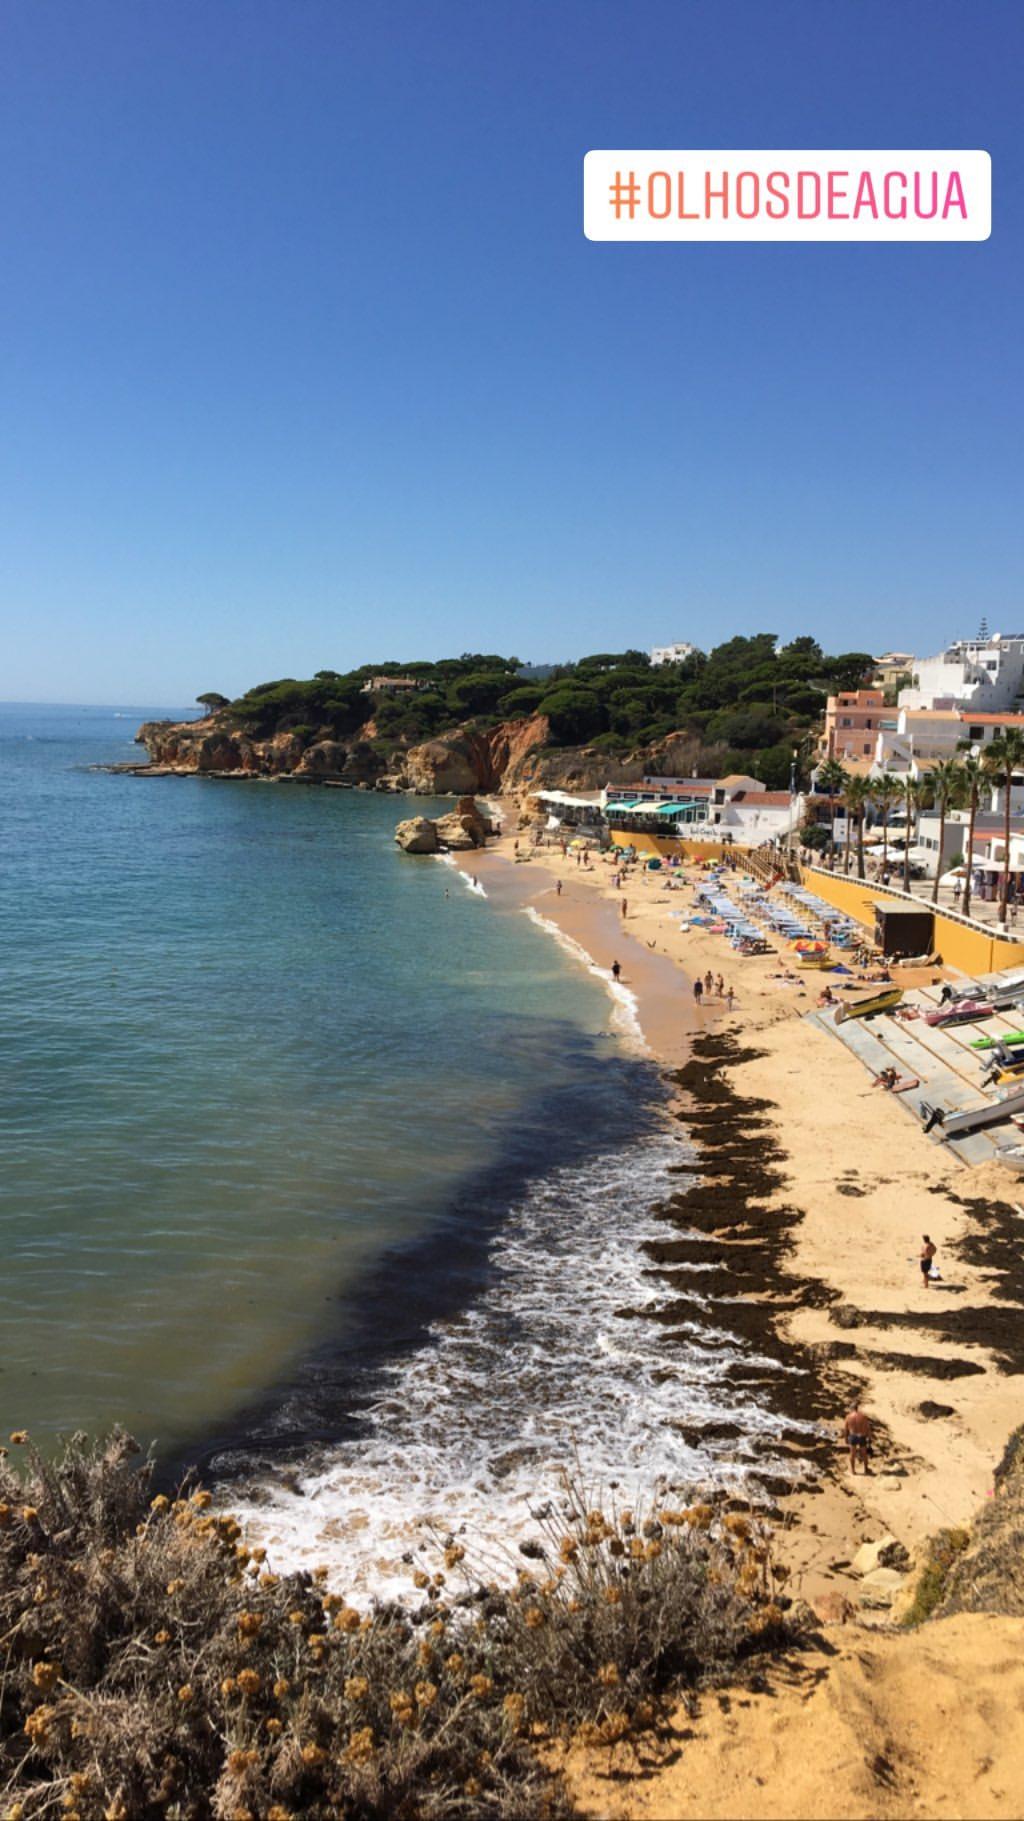 Portugal - Olhos de Agua